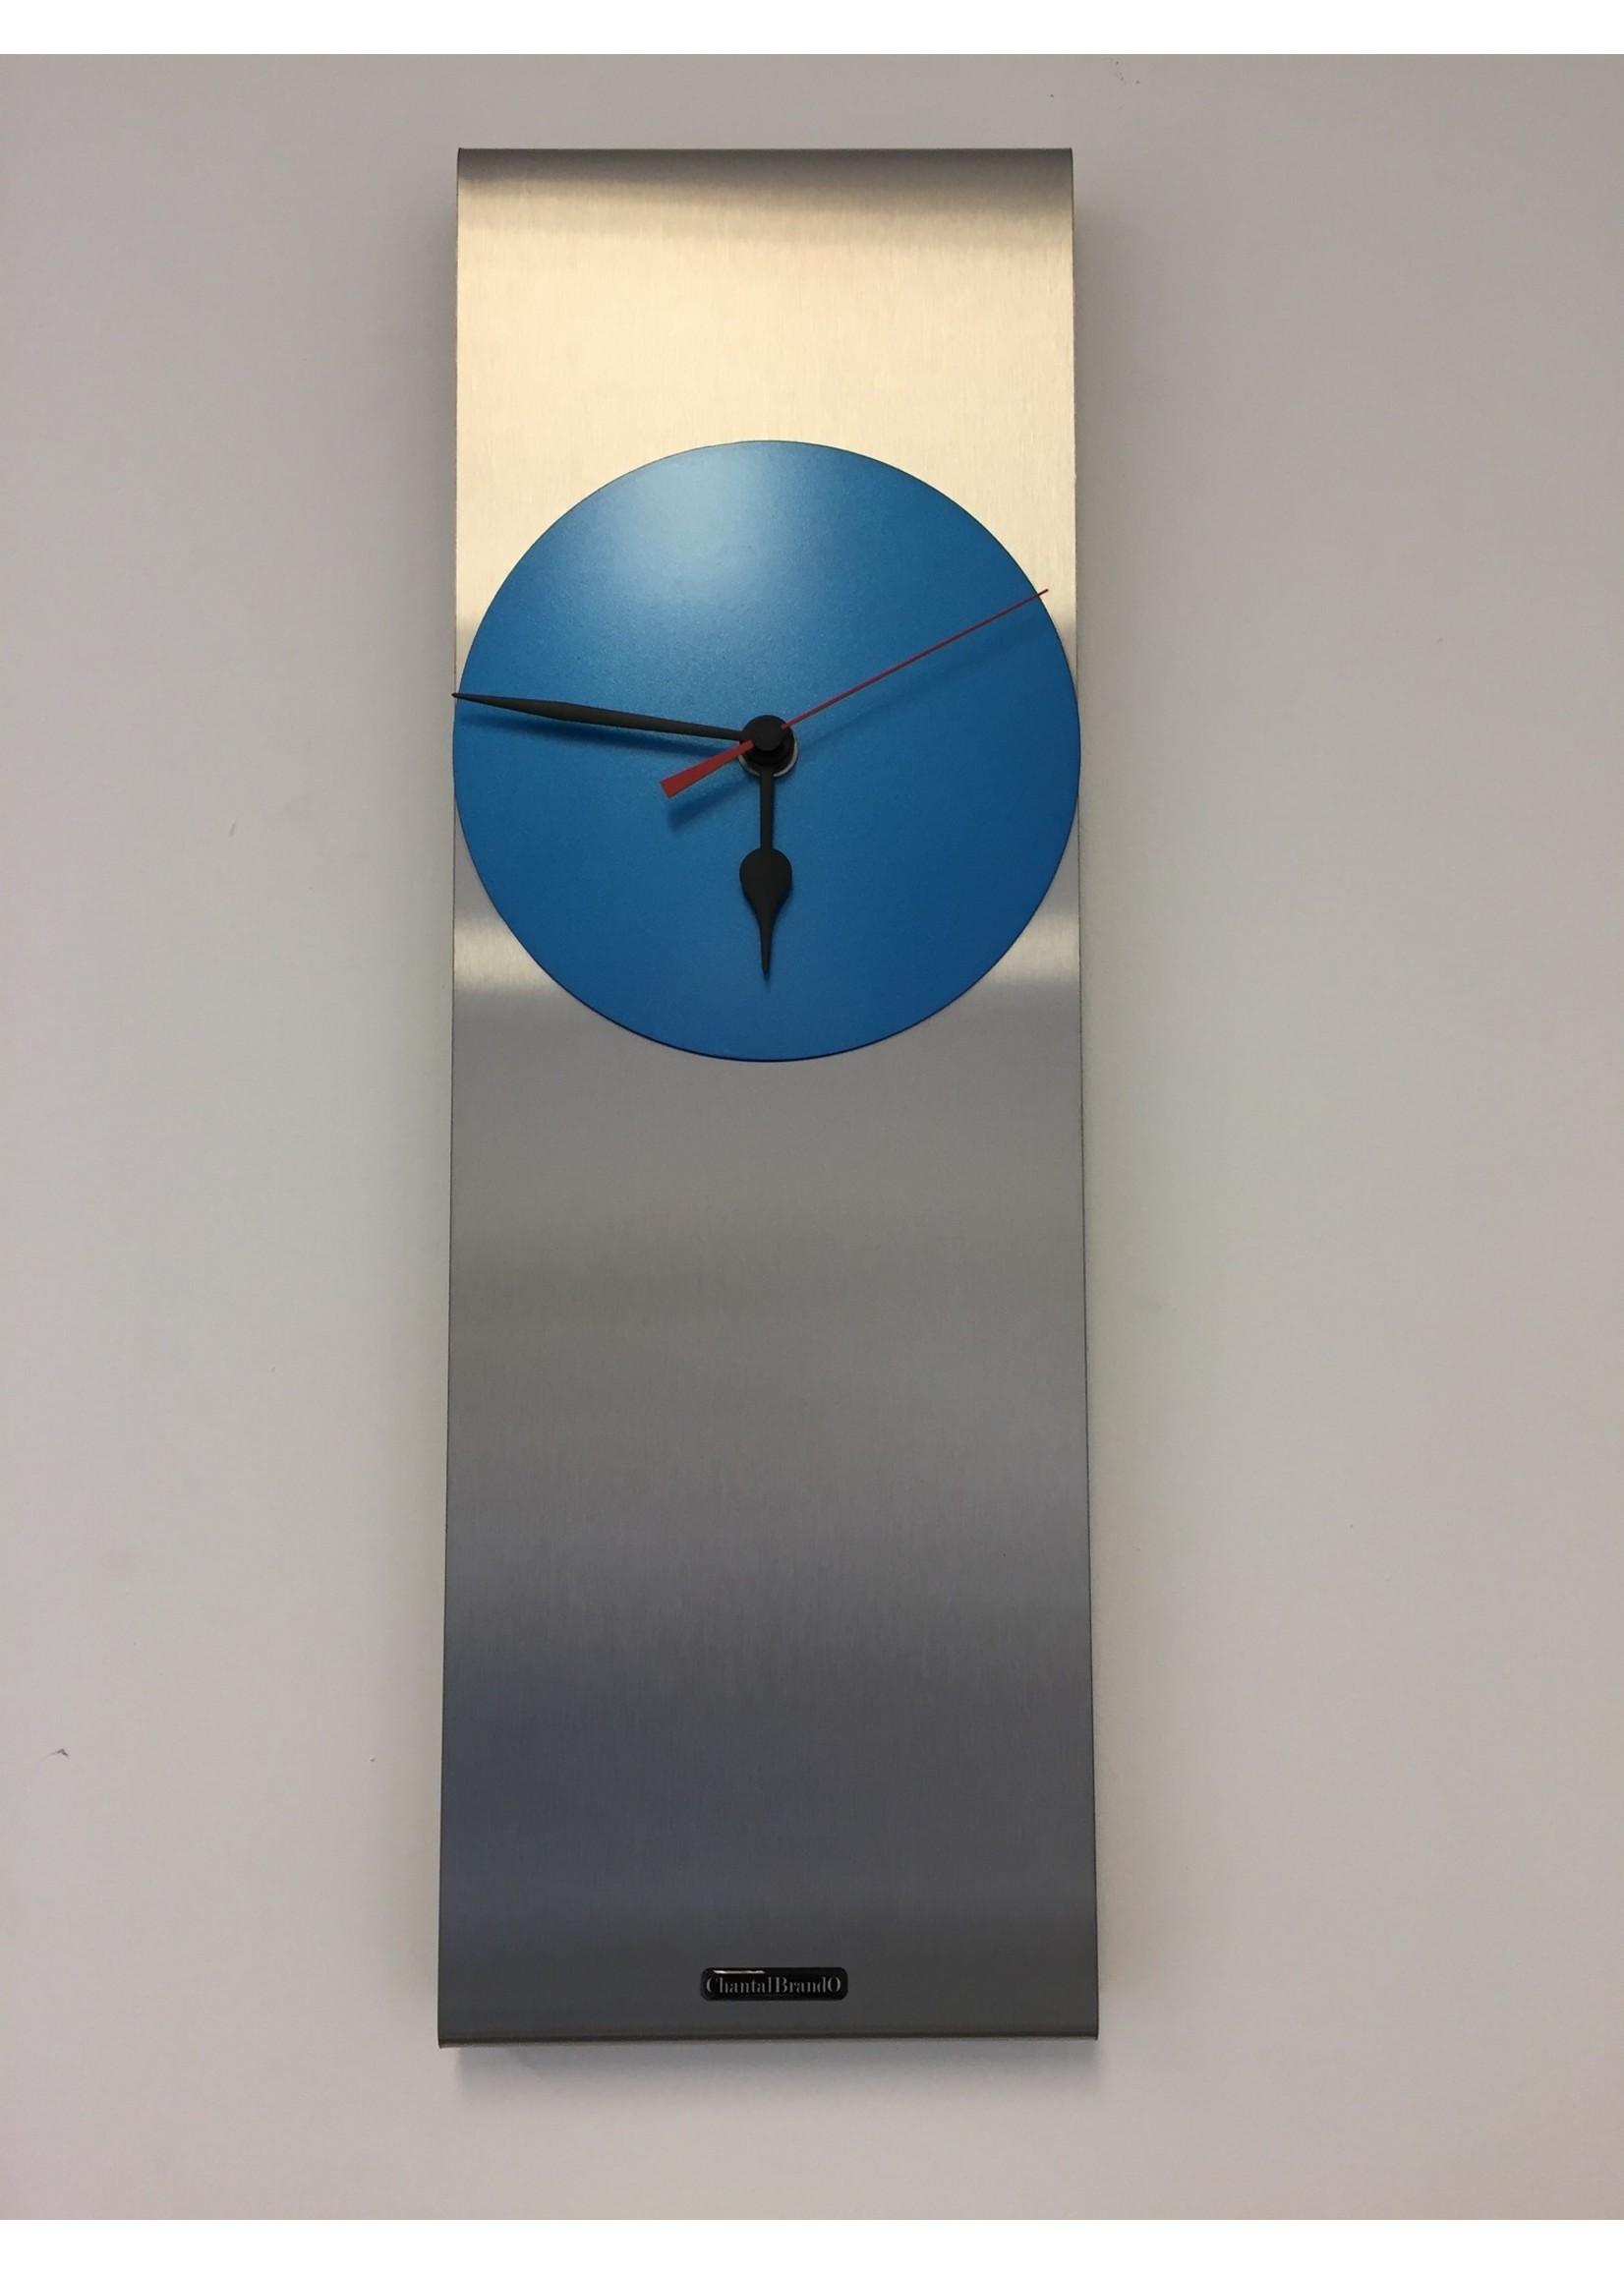 ChantalBrandO Wandklok ChantalBrando Cassiopeia ARTIC BLUE modern design